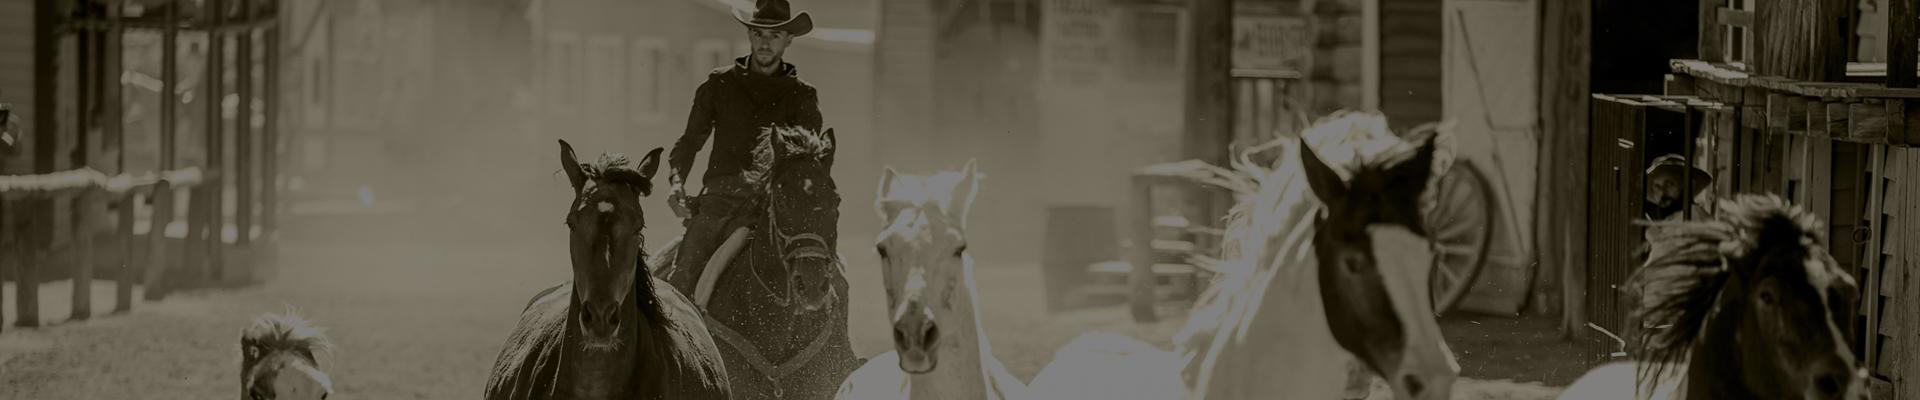 Estampida de caballos en Sioux City Park Gran Canaria